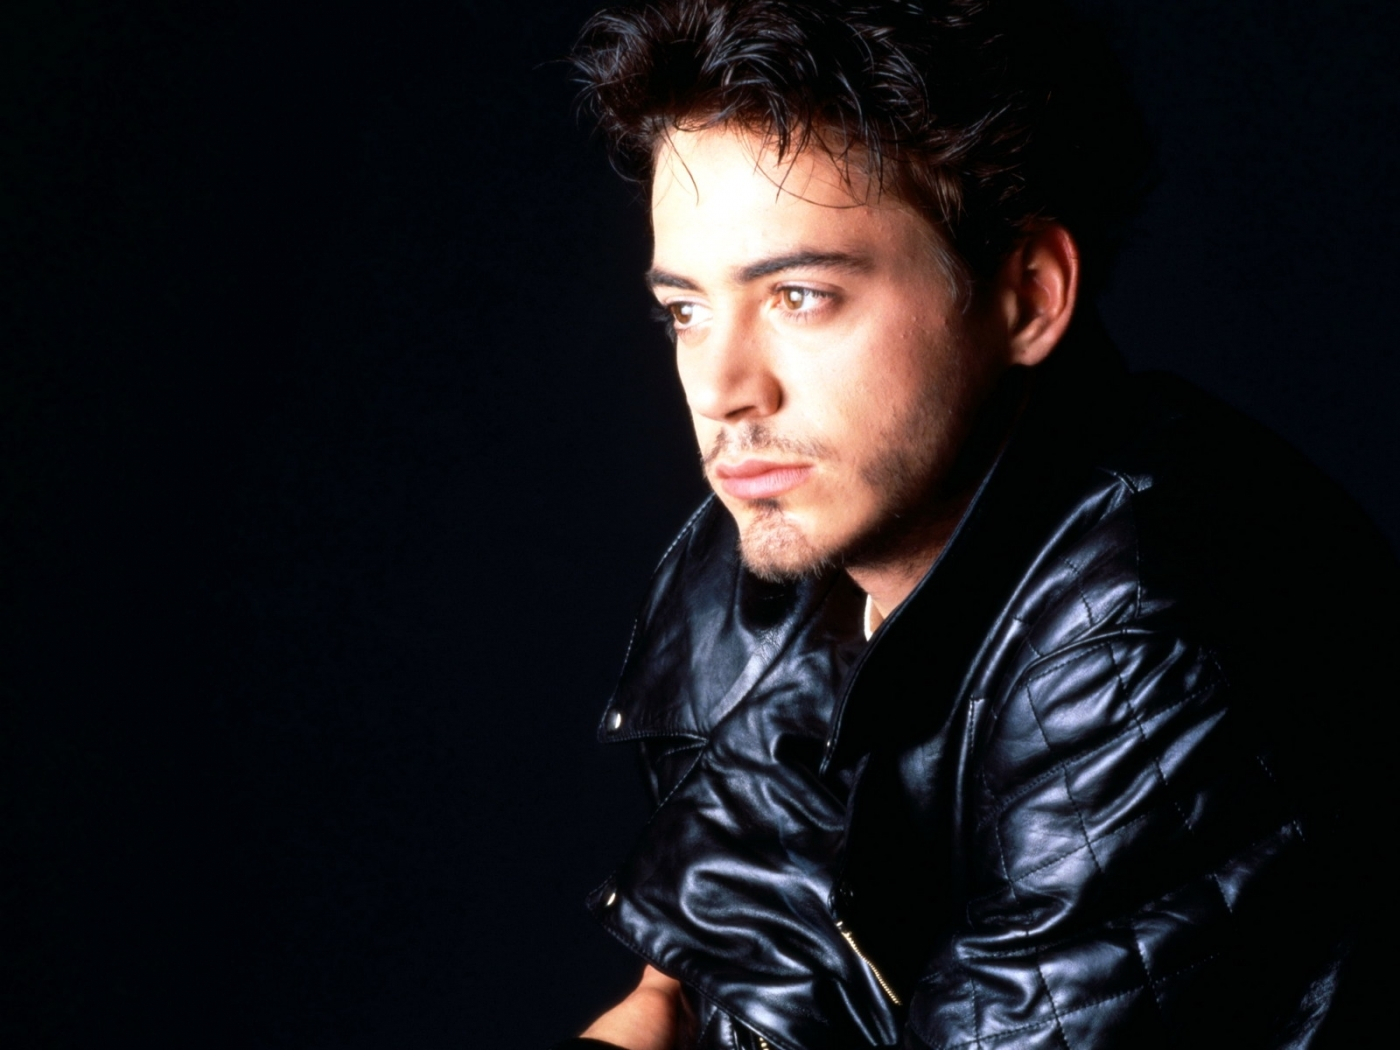 27319 Screensavers and Wallpapers Robert Downey Jr. for phone. Download People, Actors, Men, Robert Downey Jr. pictures for free